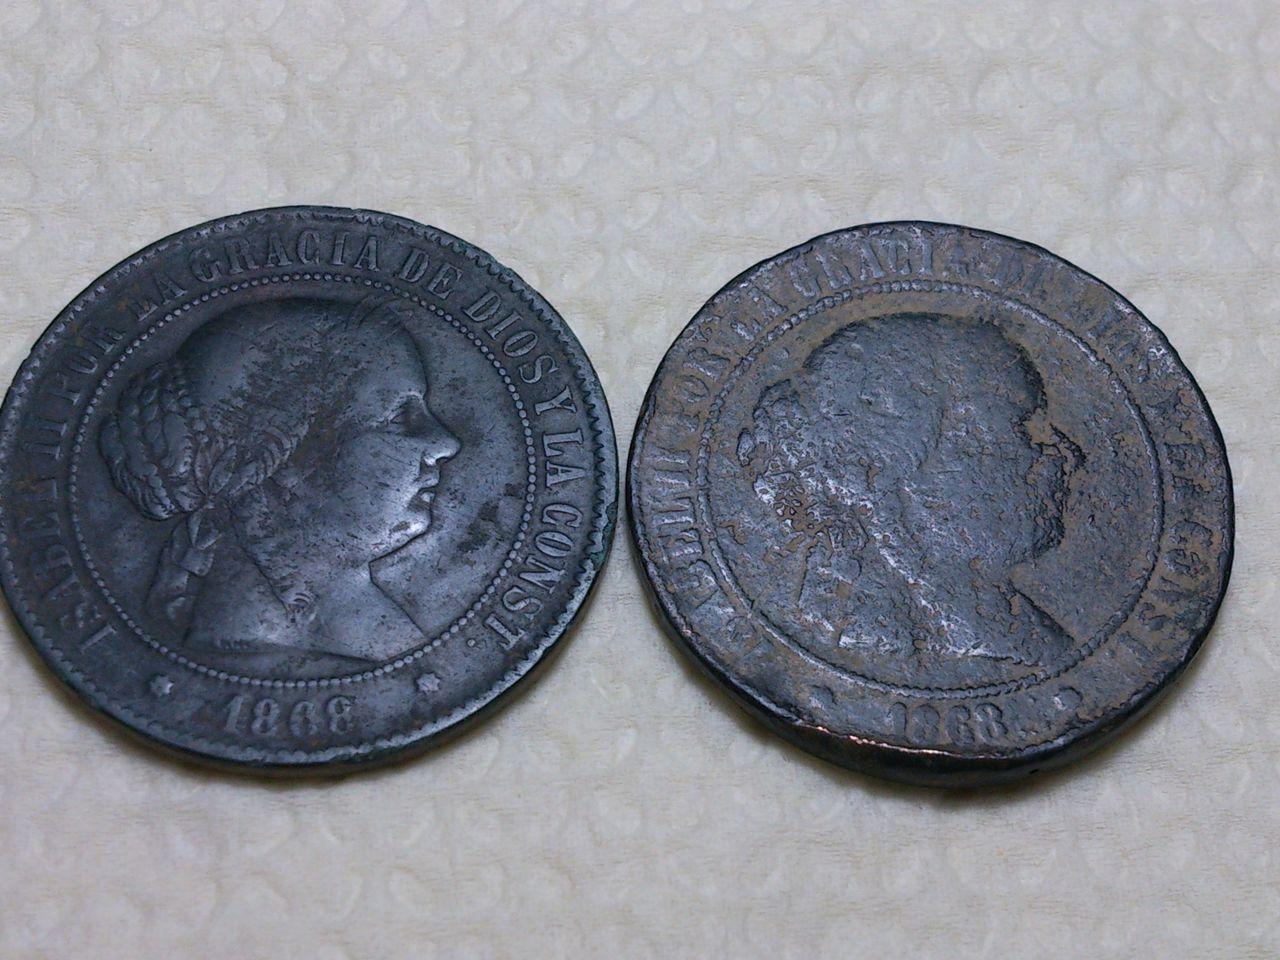 5 Centimos de escudo 1868 Isabel II. Barcelona. - Falsa o fundida? DSC_0308